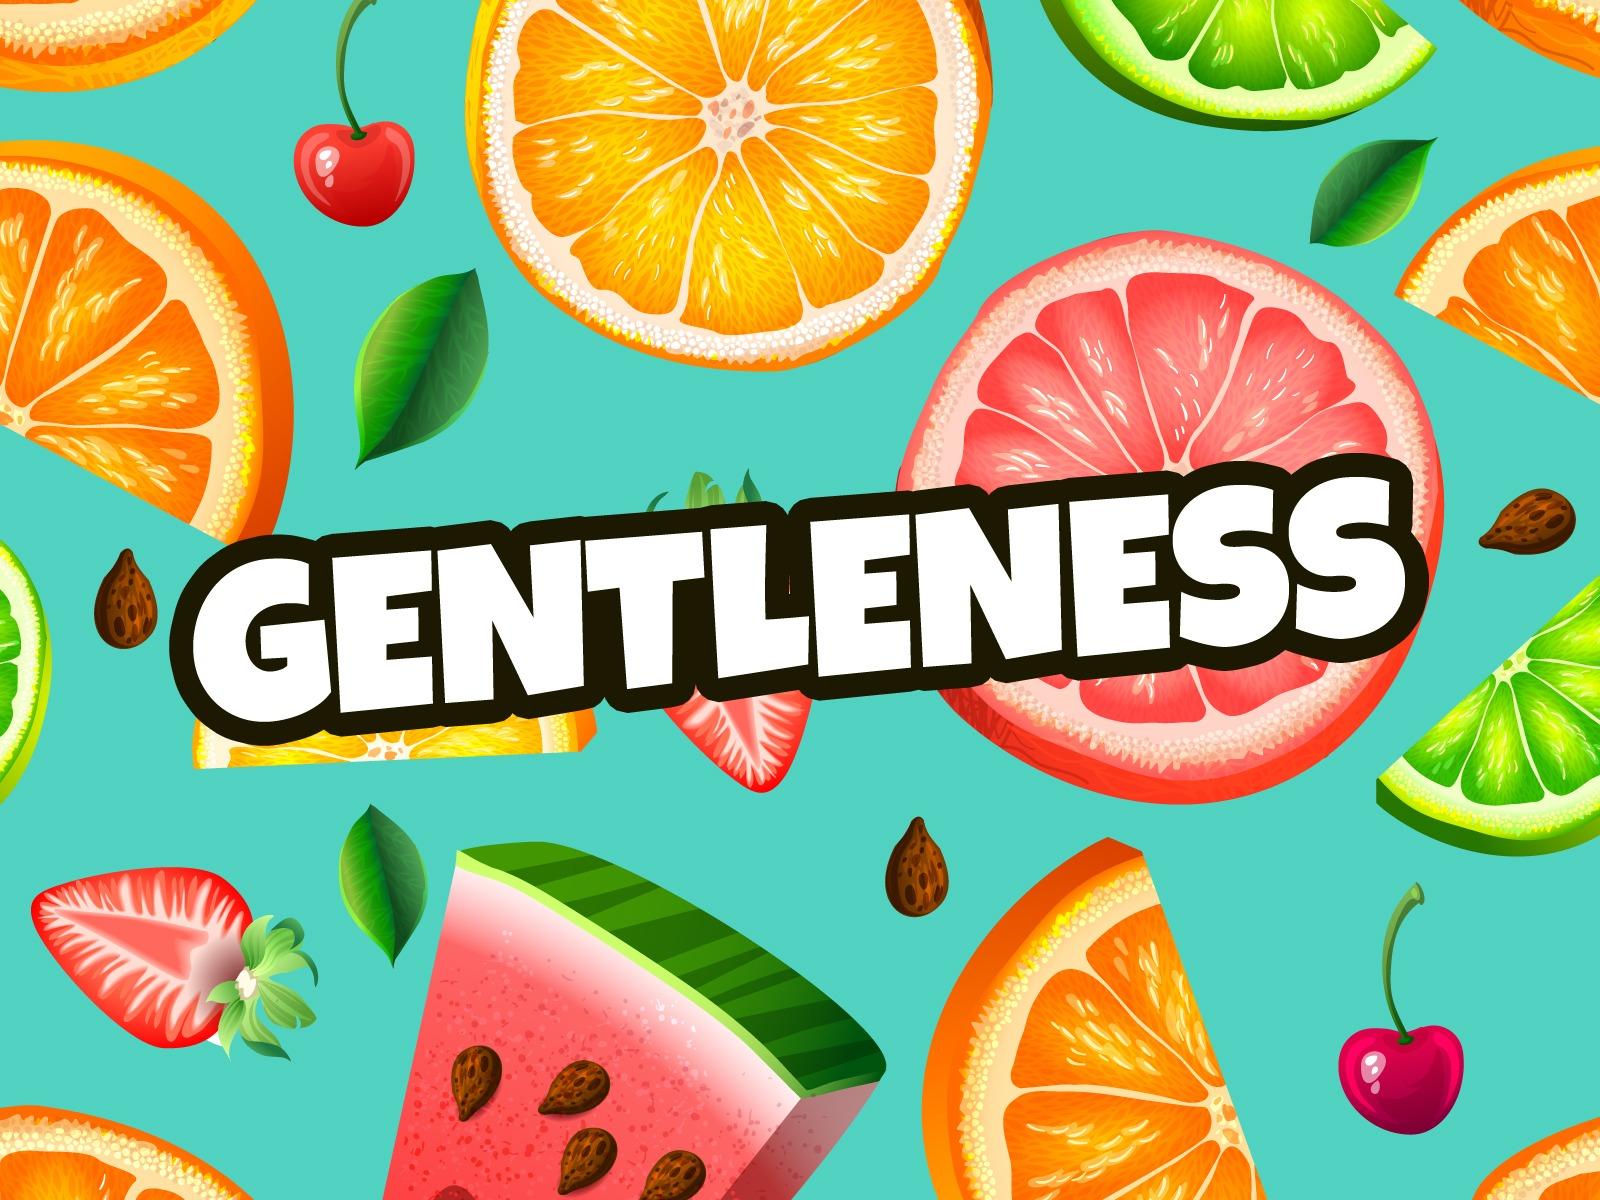 'Gentleness' Fruit of the Spirit Childrens Lesson ...